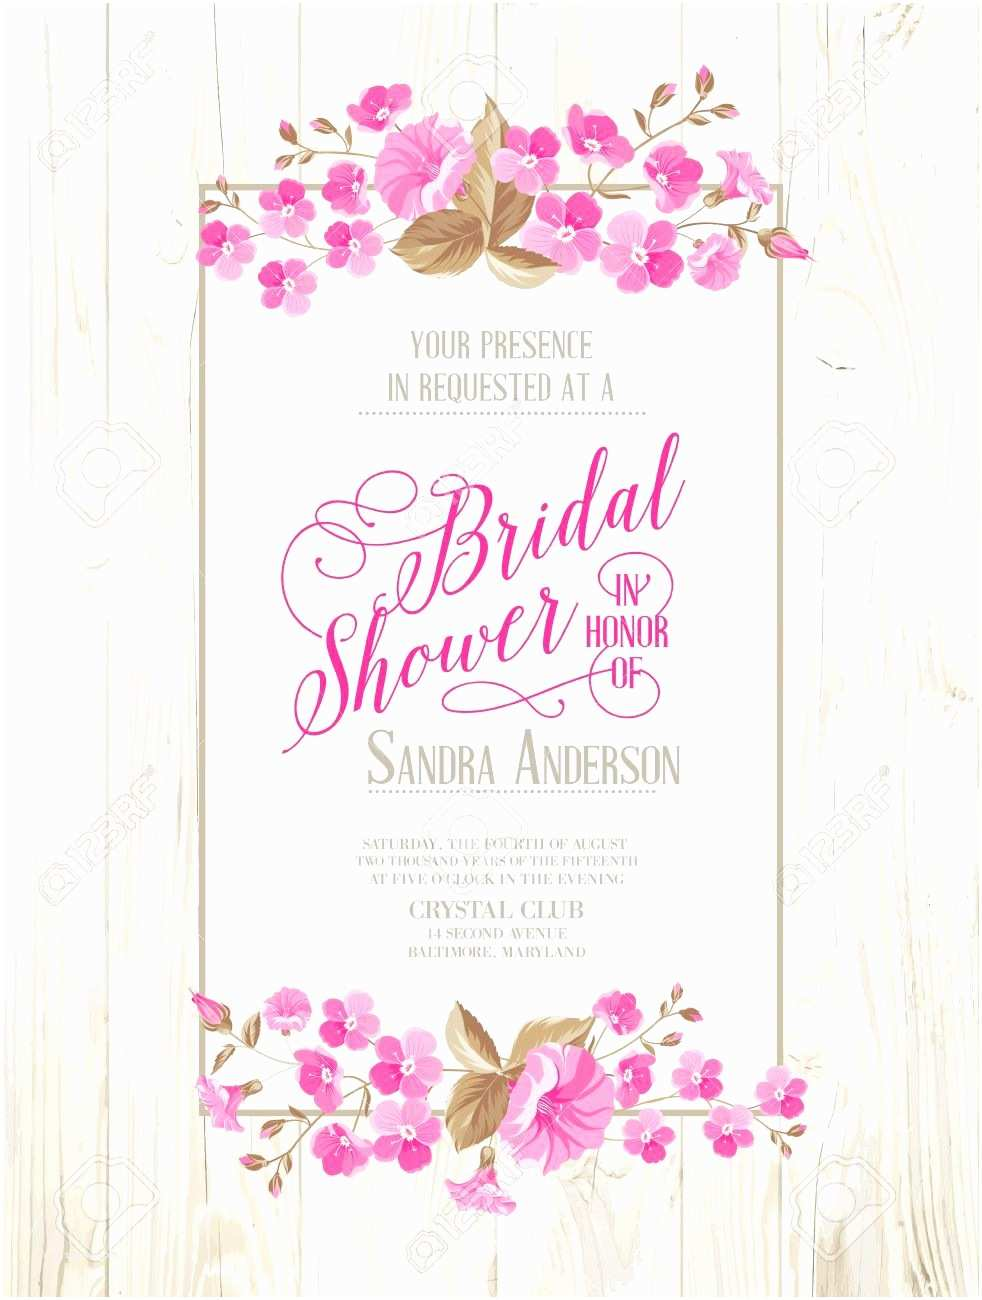 Invitations for Bridal Shower Invitations Templates Vintage Wedding Shower Invitations